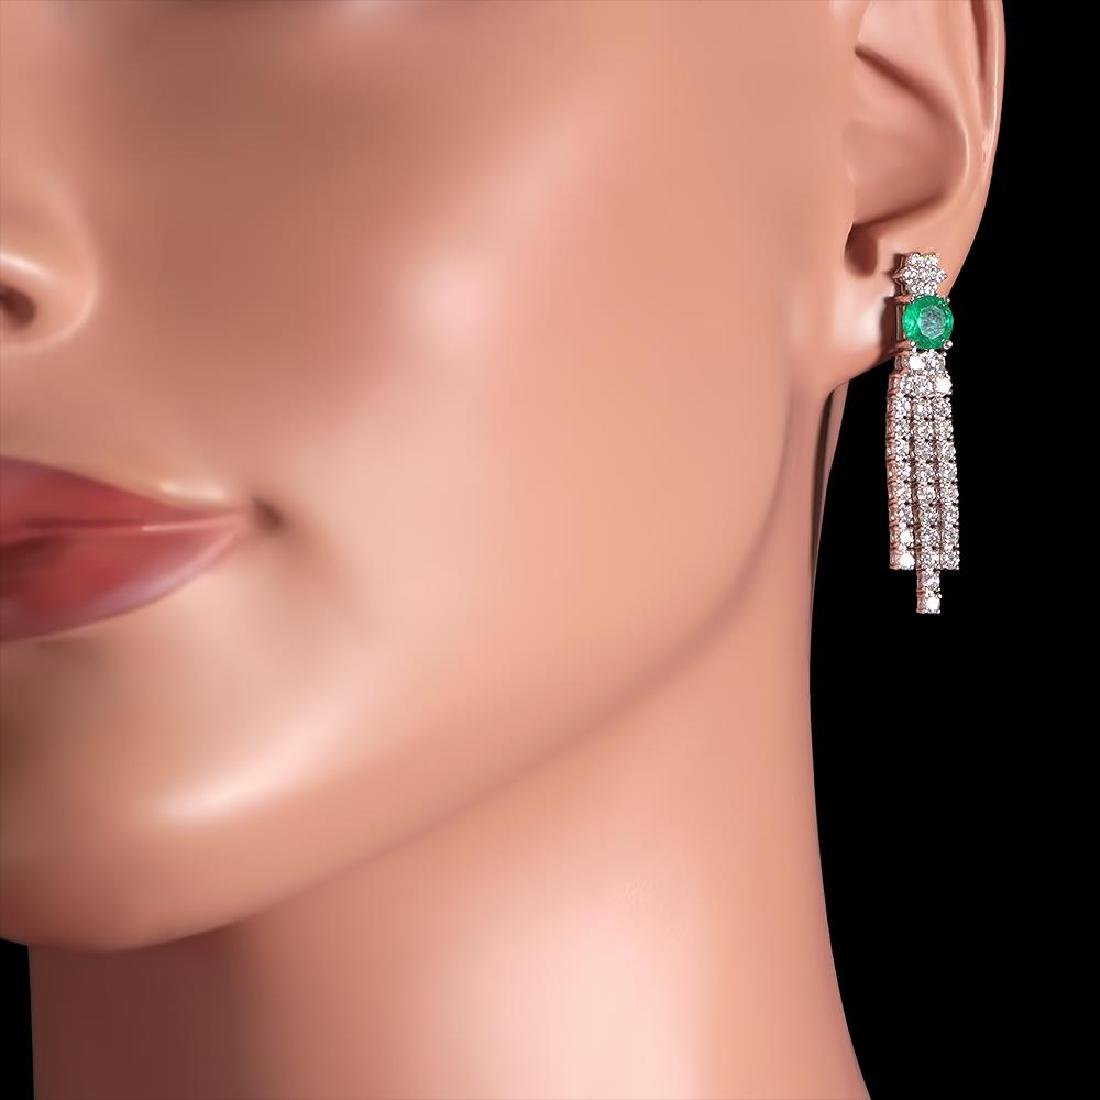 14k White Gold 1.70ct Emerald 2.62ct Diamond Earrings - 3